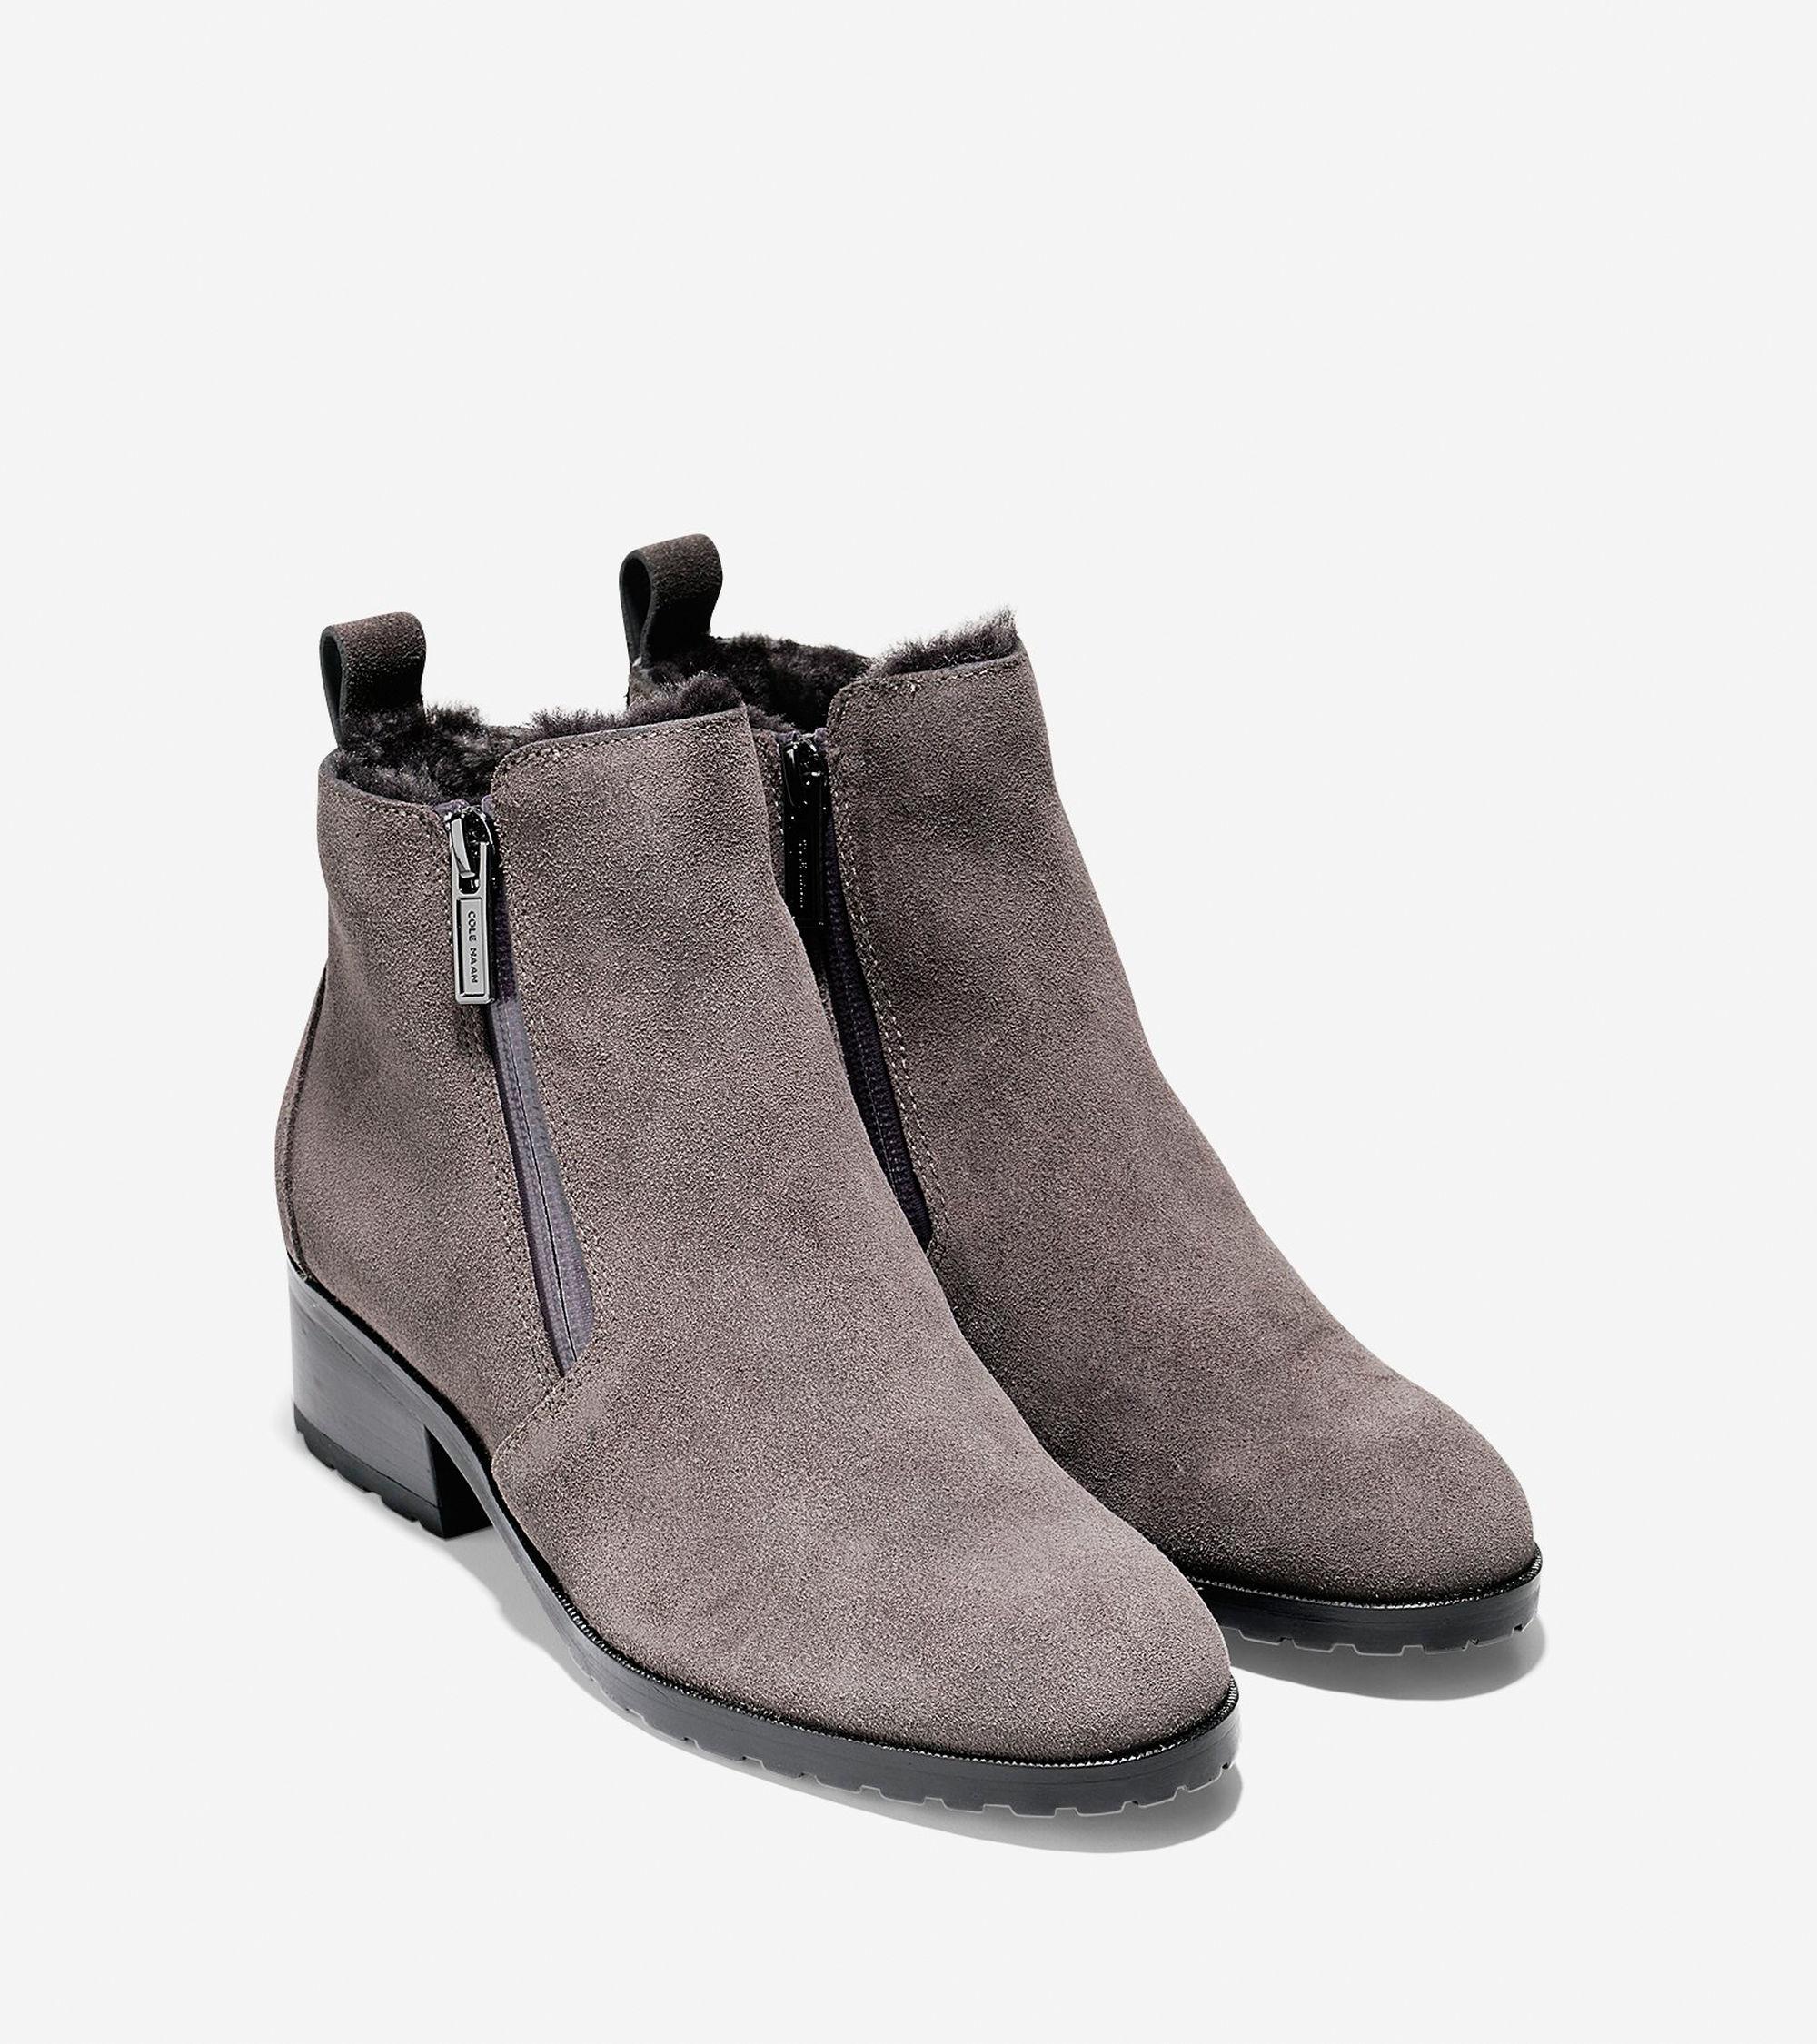 Womens Boots Cole Haan Oak Waterproof Shearling Bootie Stormcloud Suede/Shearling